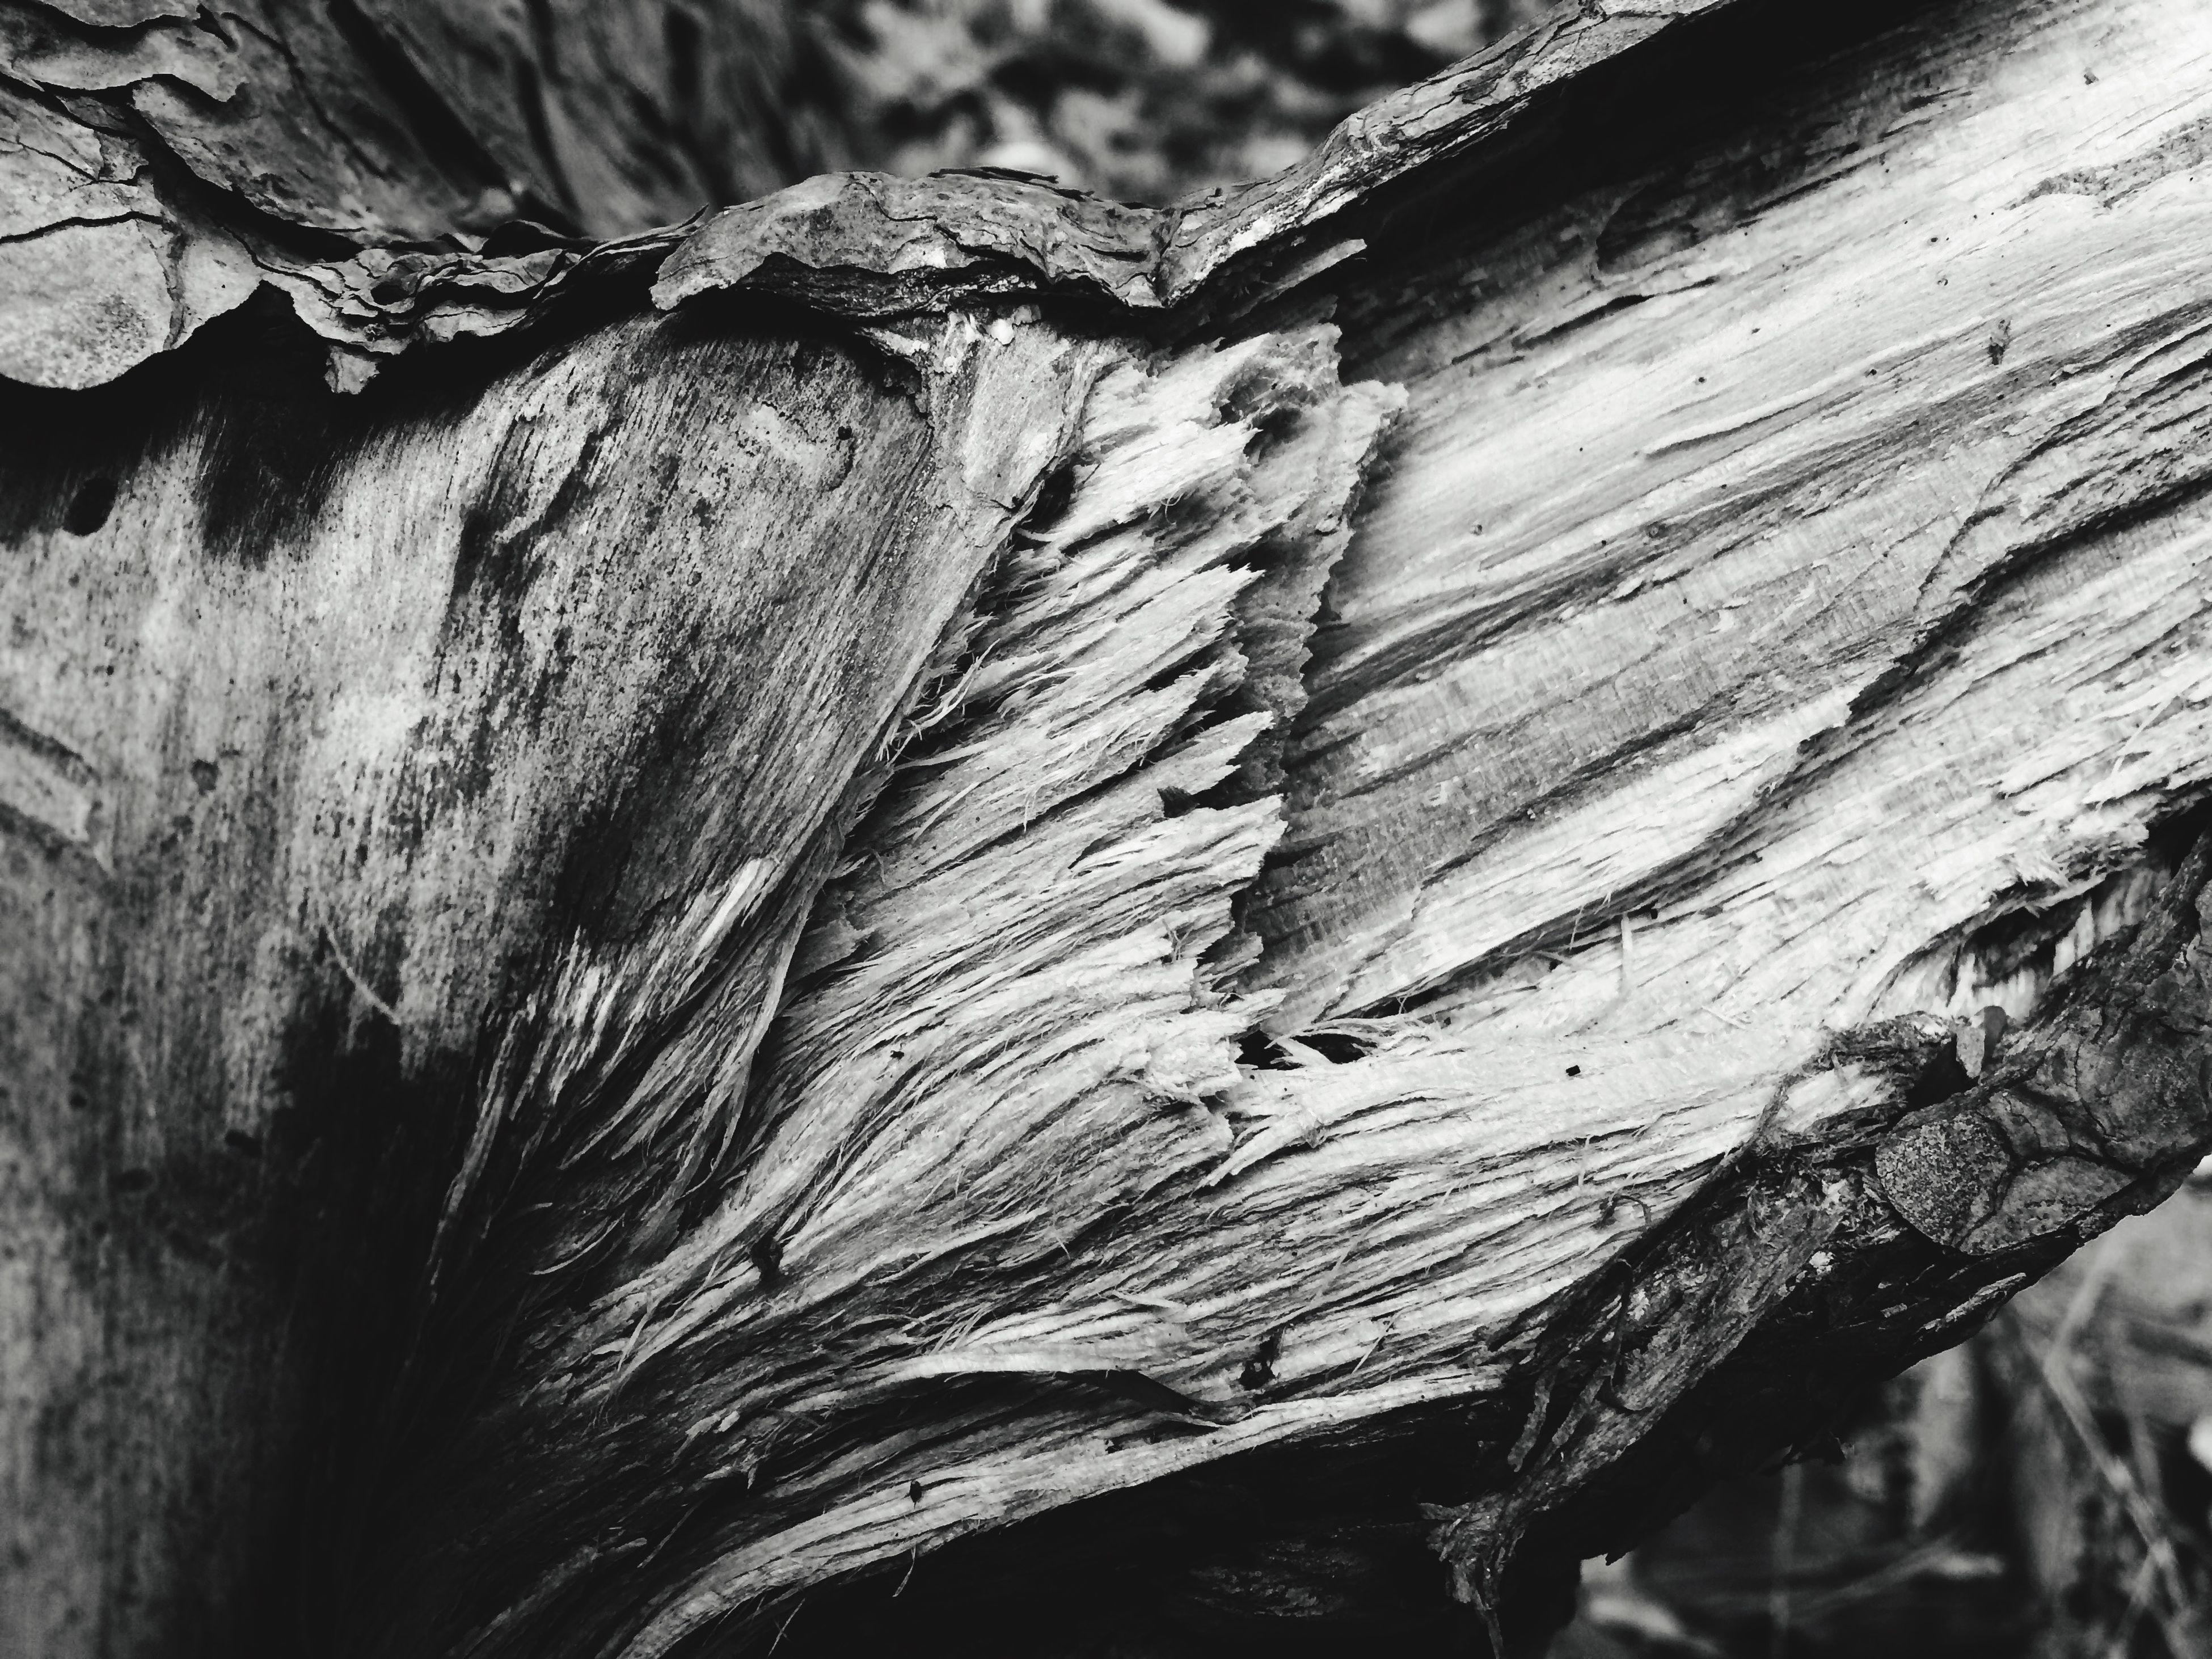 Black & White Outdoors Nature